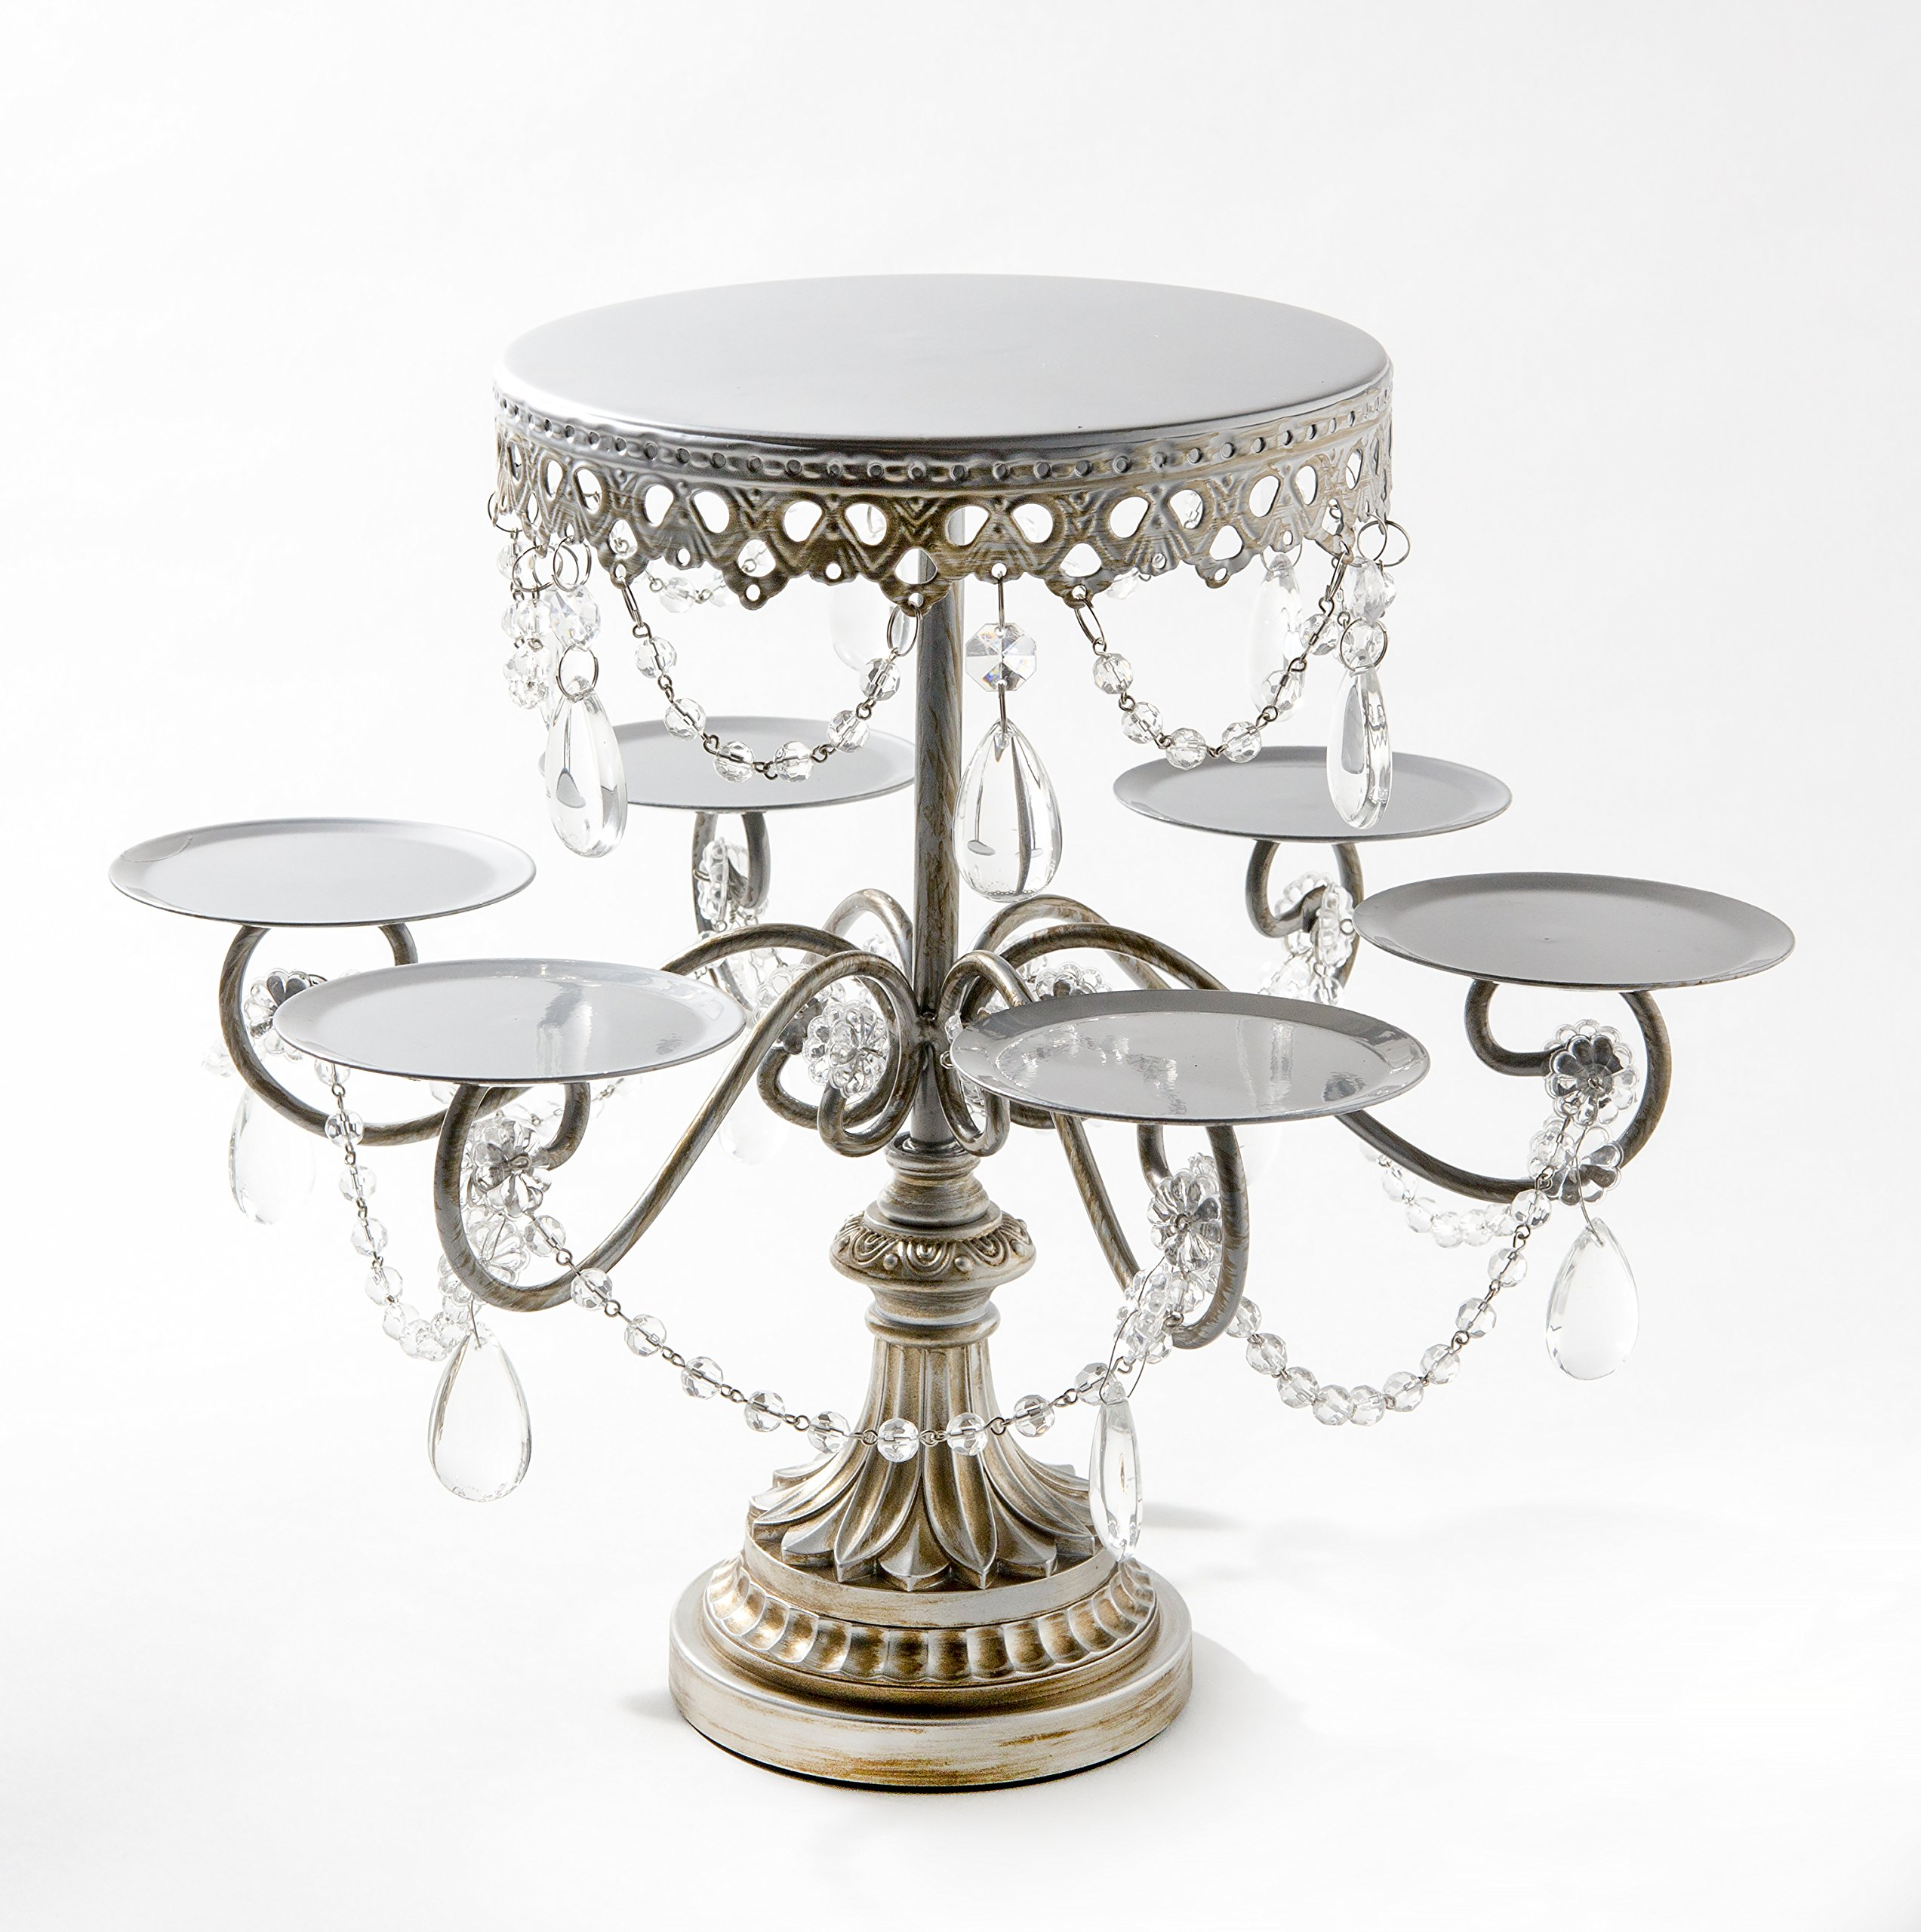 Opulent Treasures Rosebud Chandelier 7 Plate Metal Cupcake, Cake Pop, Mini Cake Wedding Dessert Tiered Tower (Silver)